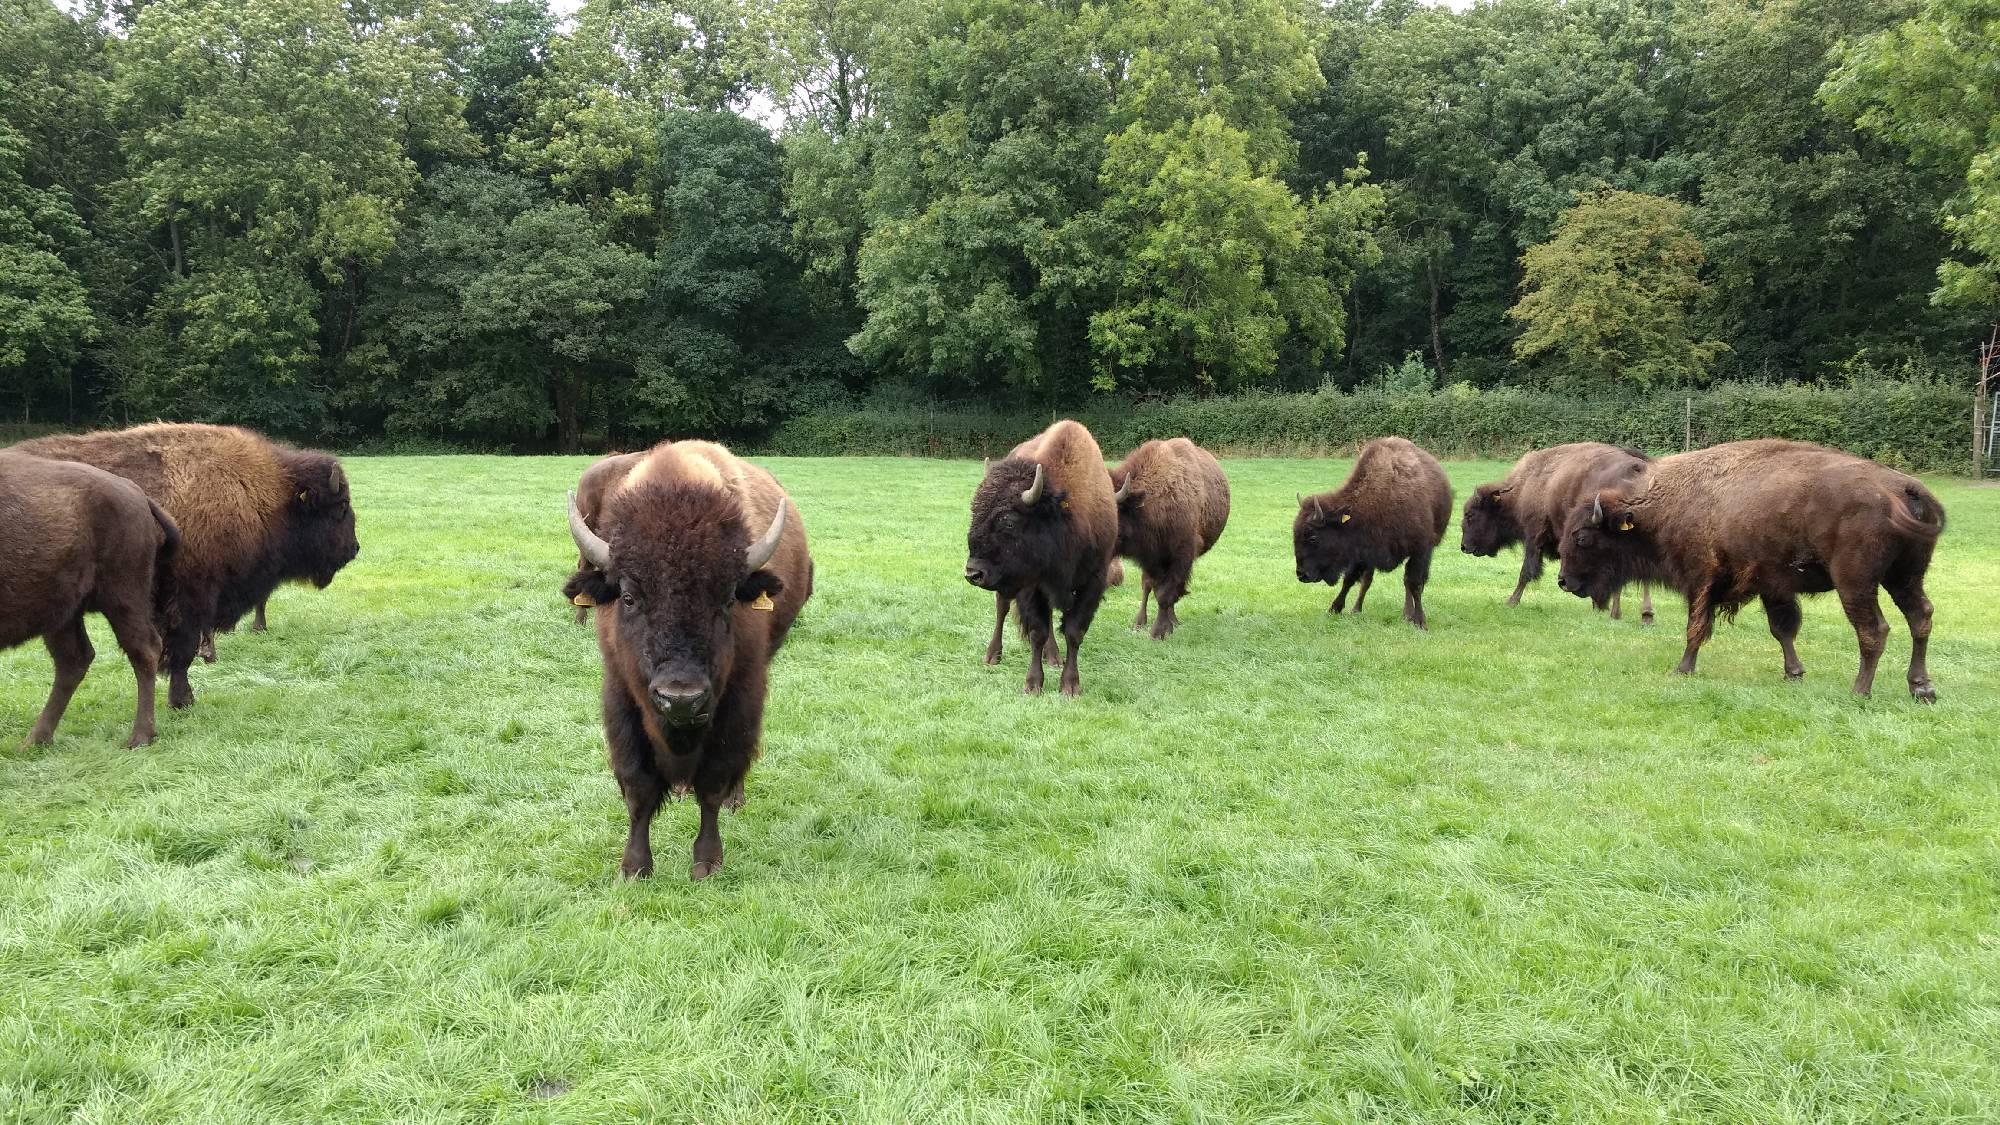 The Bison Farm